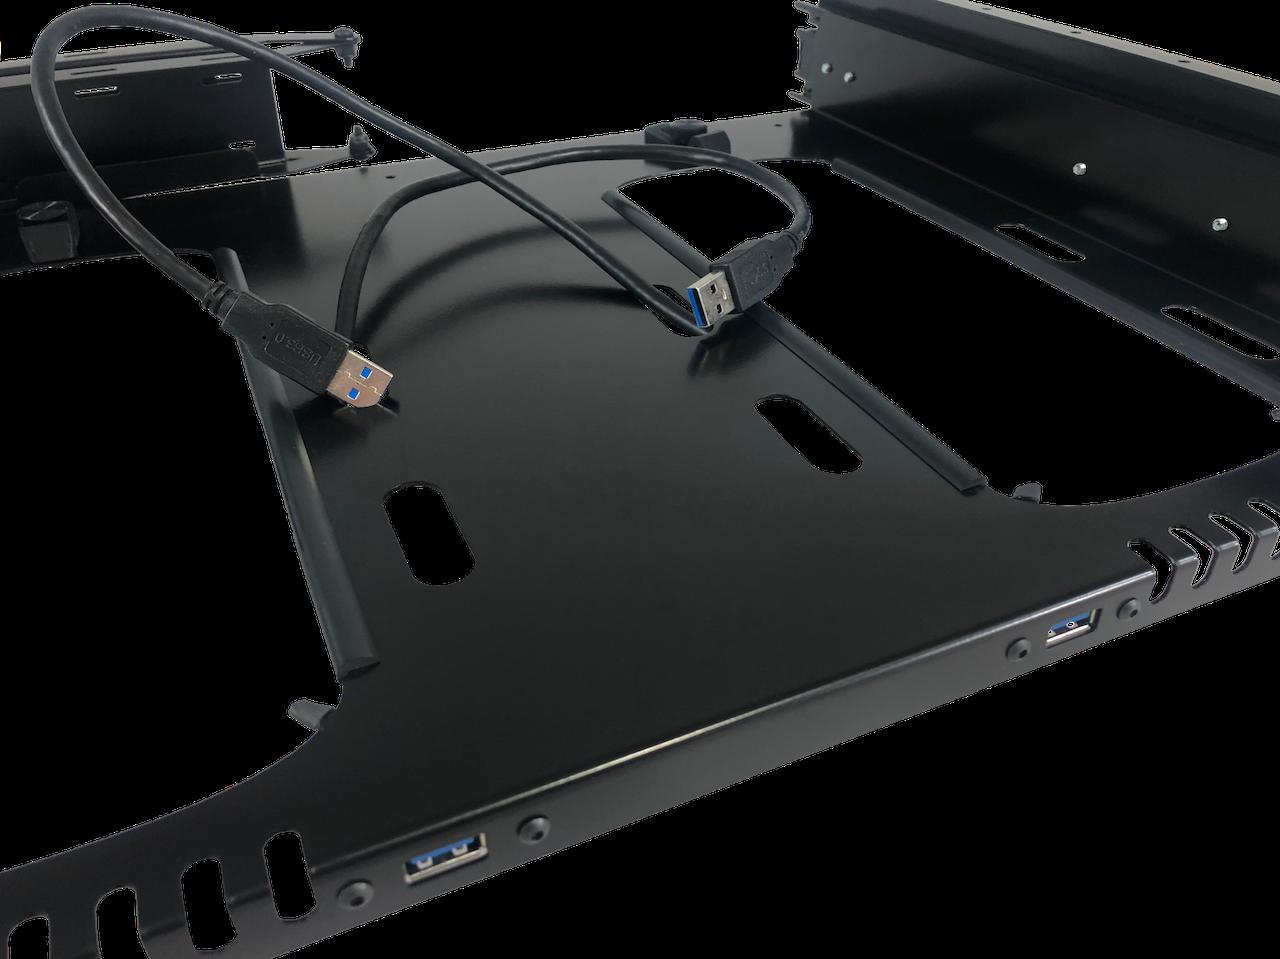 USB 3.0 Upgrade option for MPR-2X shelf